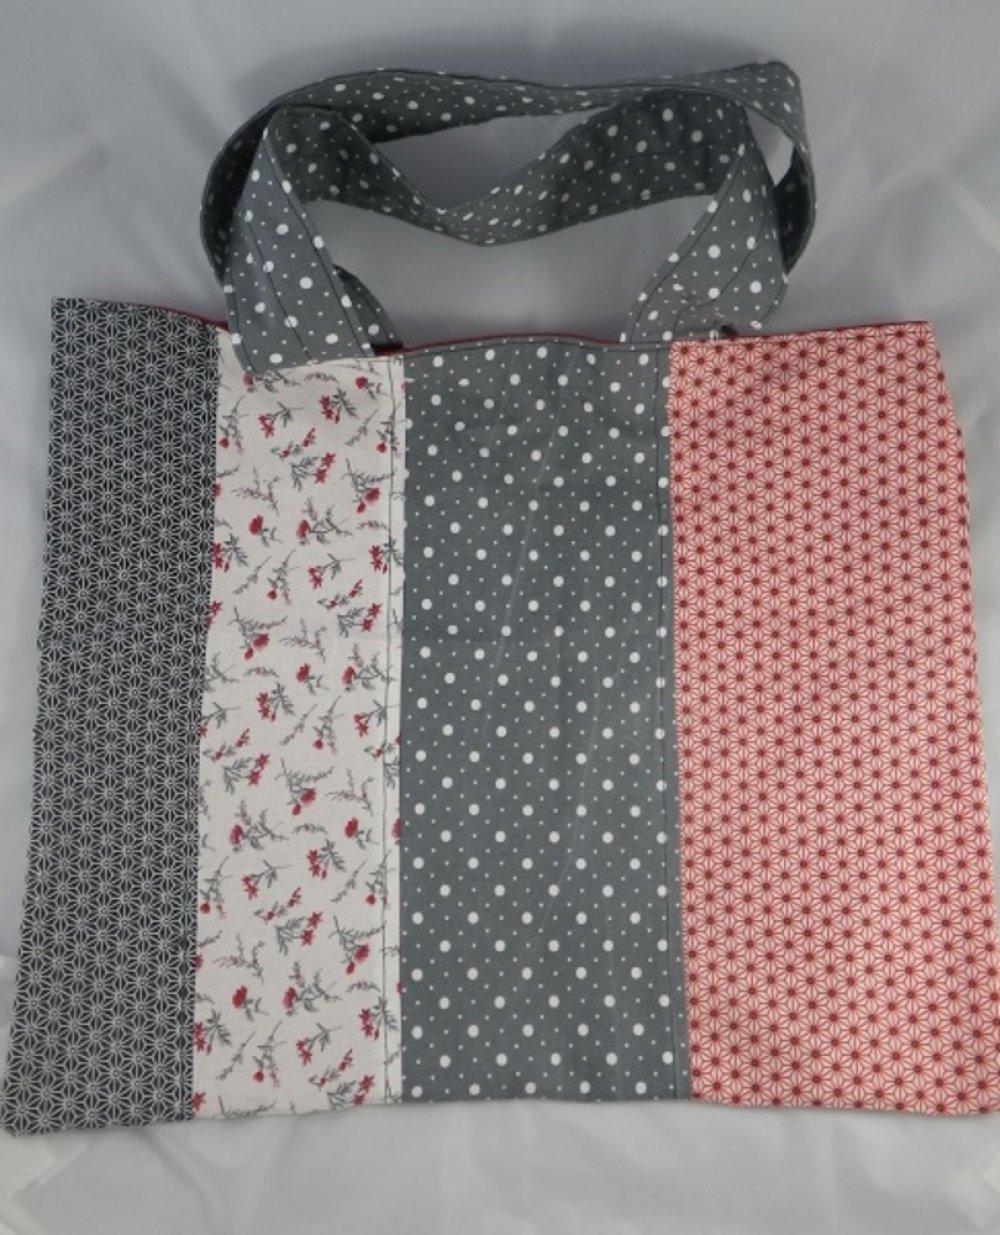 Grand sac cabas patchwork gris / blanc / rouge / noir tissus